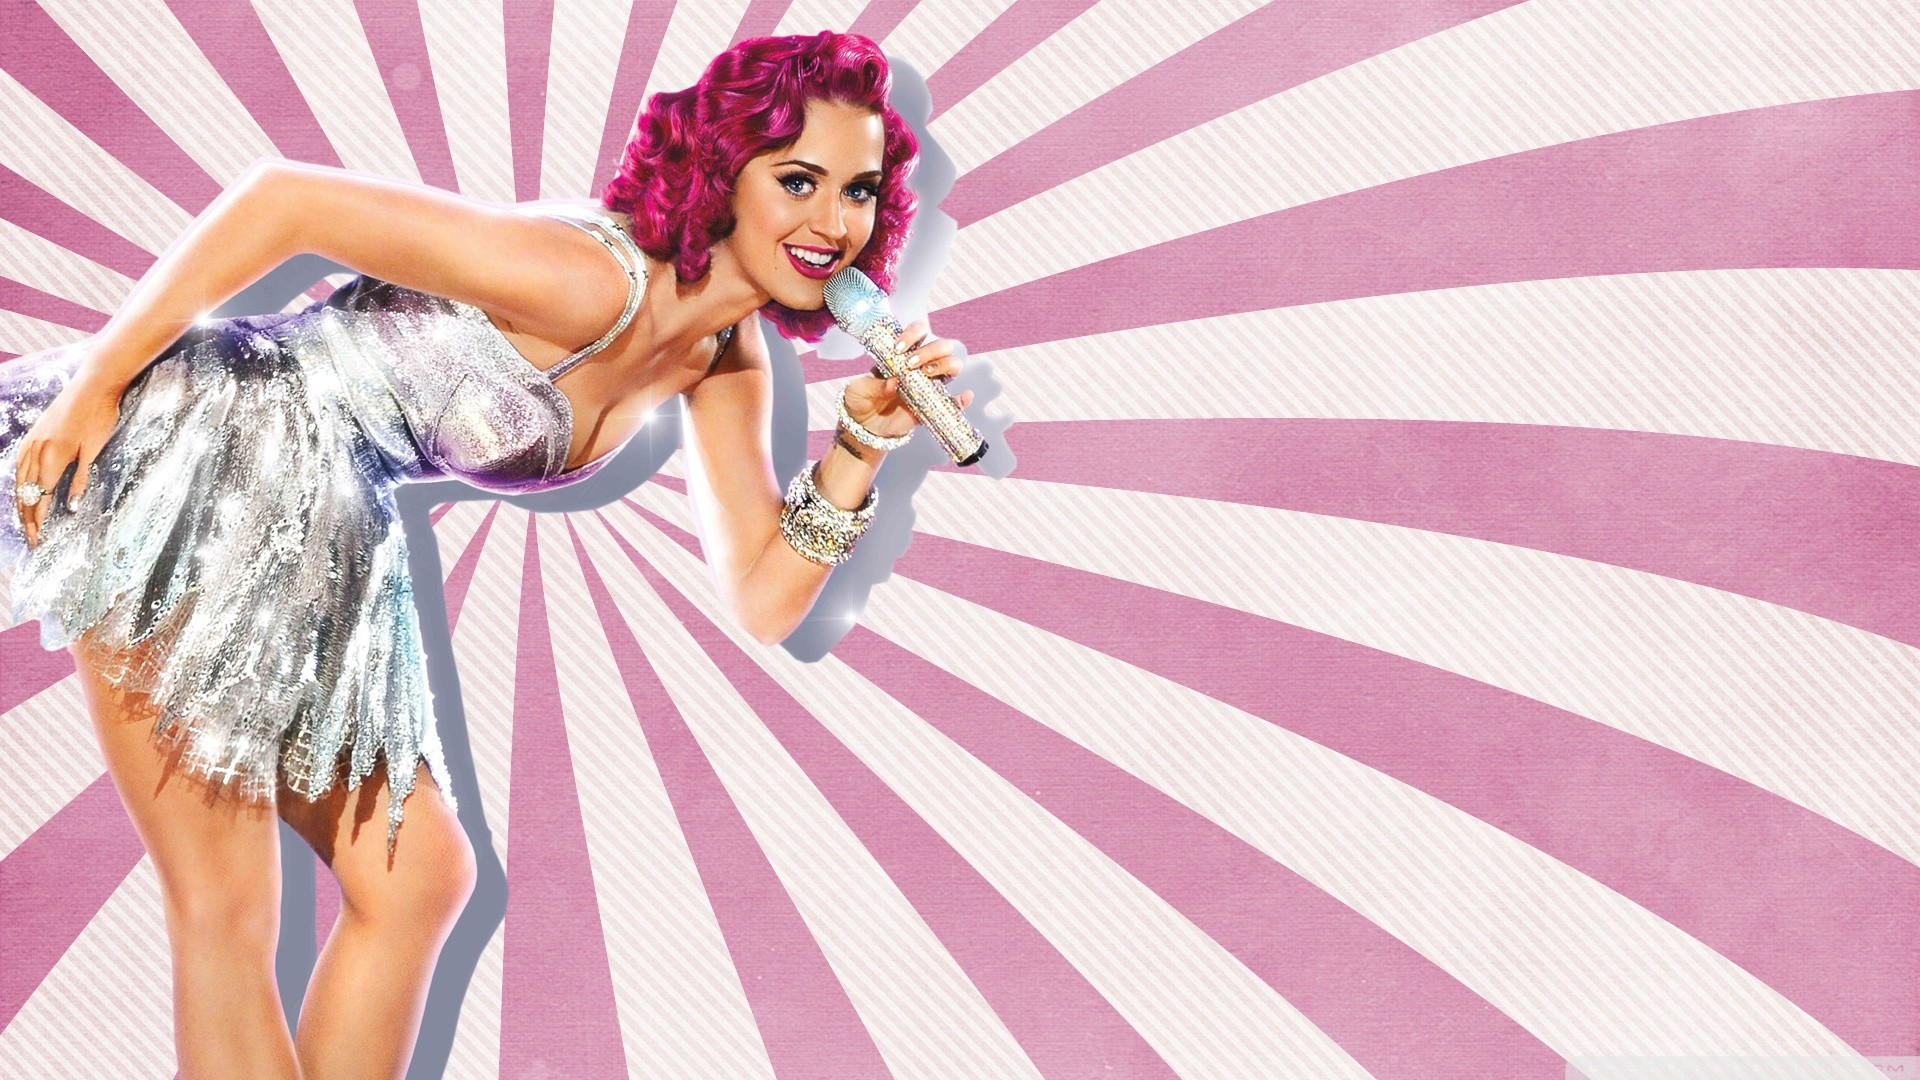 katy perry pin up girl | The PinUp Art: Katy Perry, the modern pin up  girl… | Pin Up | Pinterest | Katy perry and Lady gaga